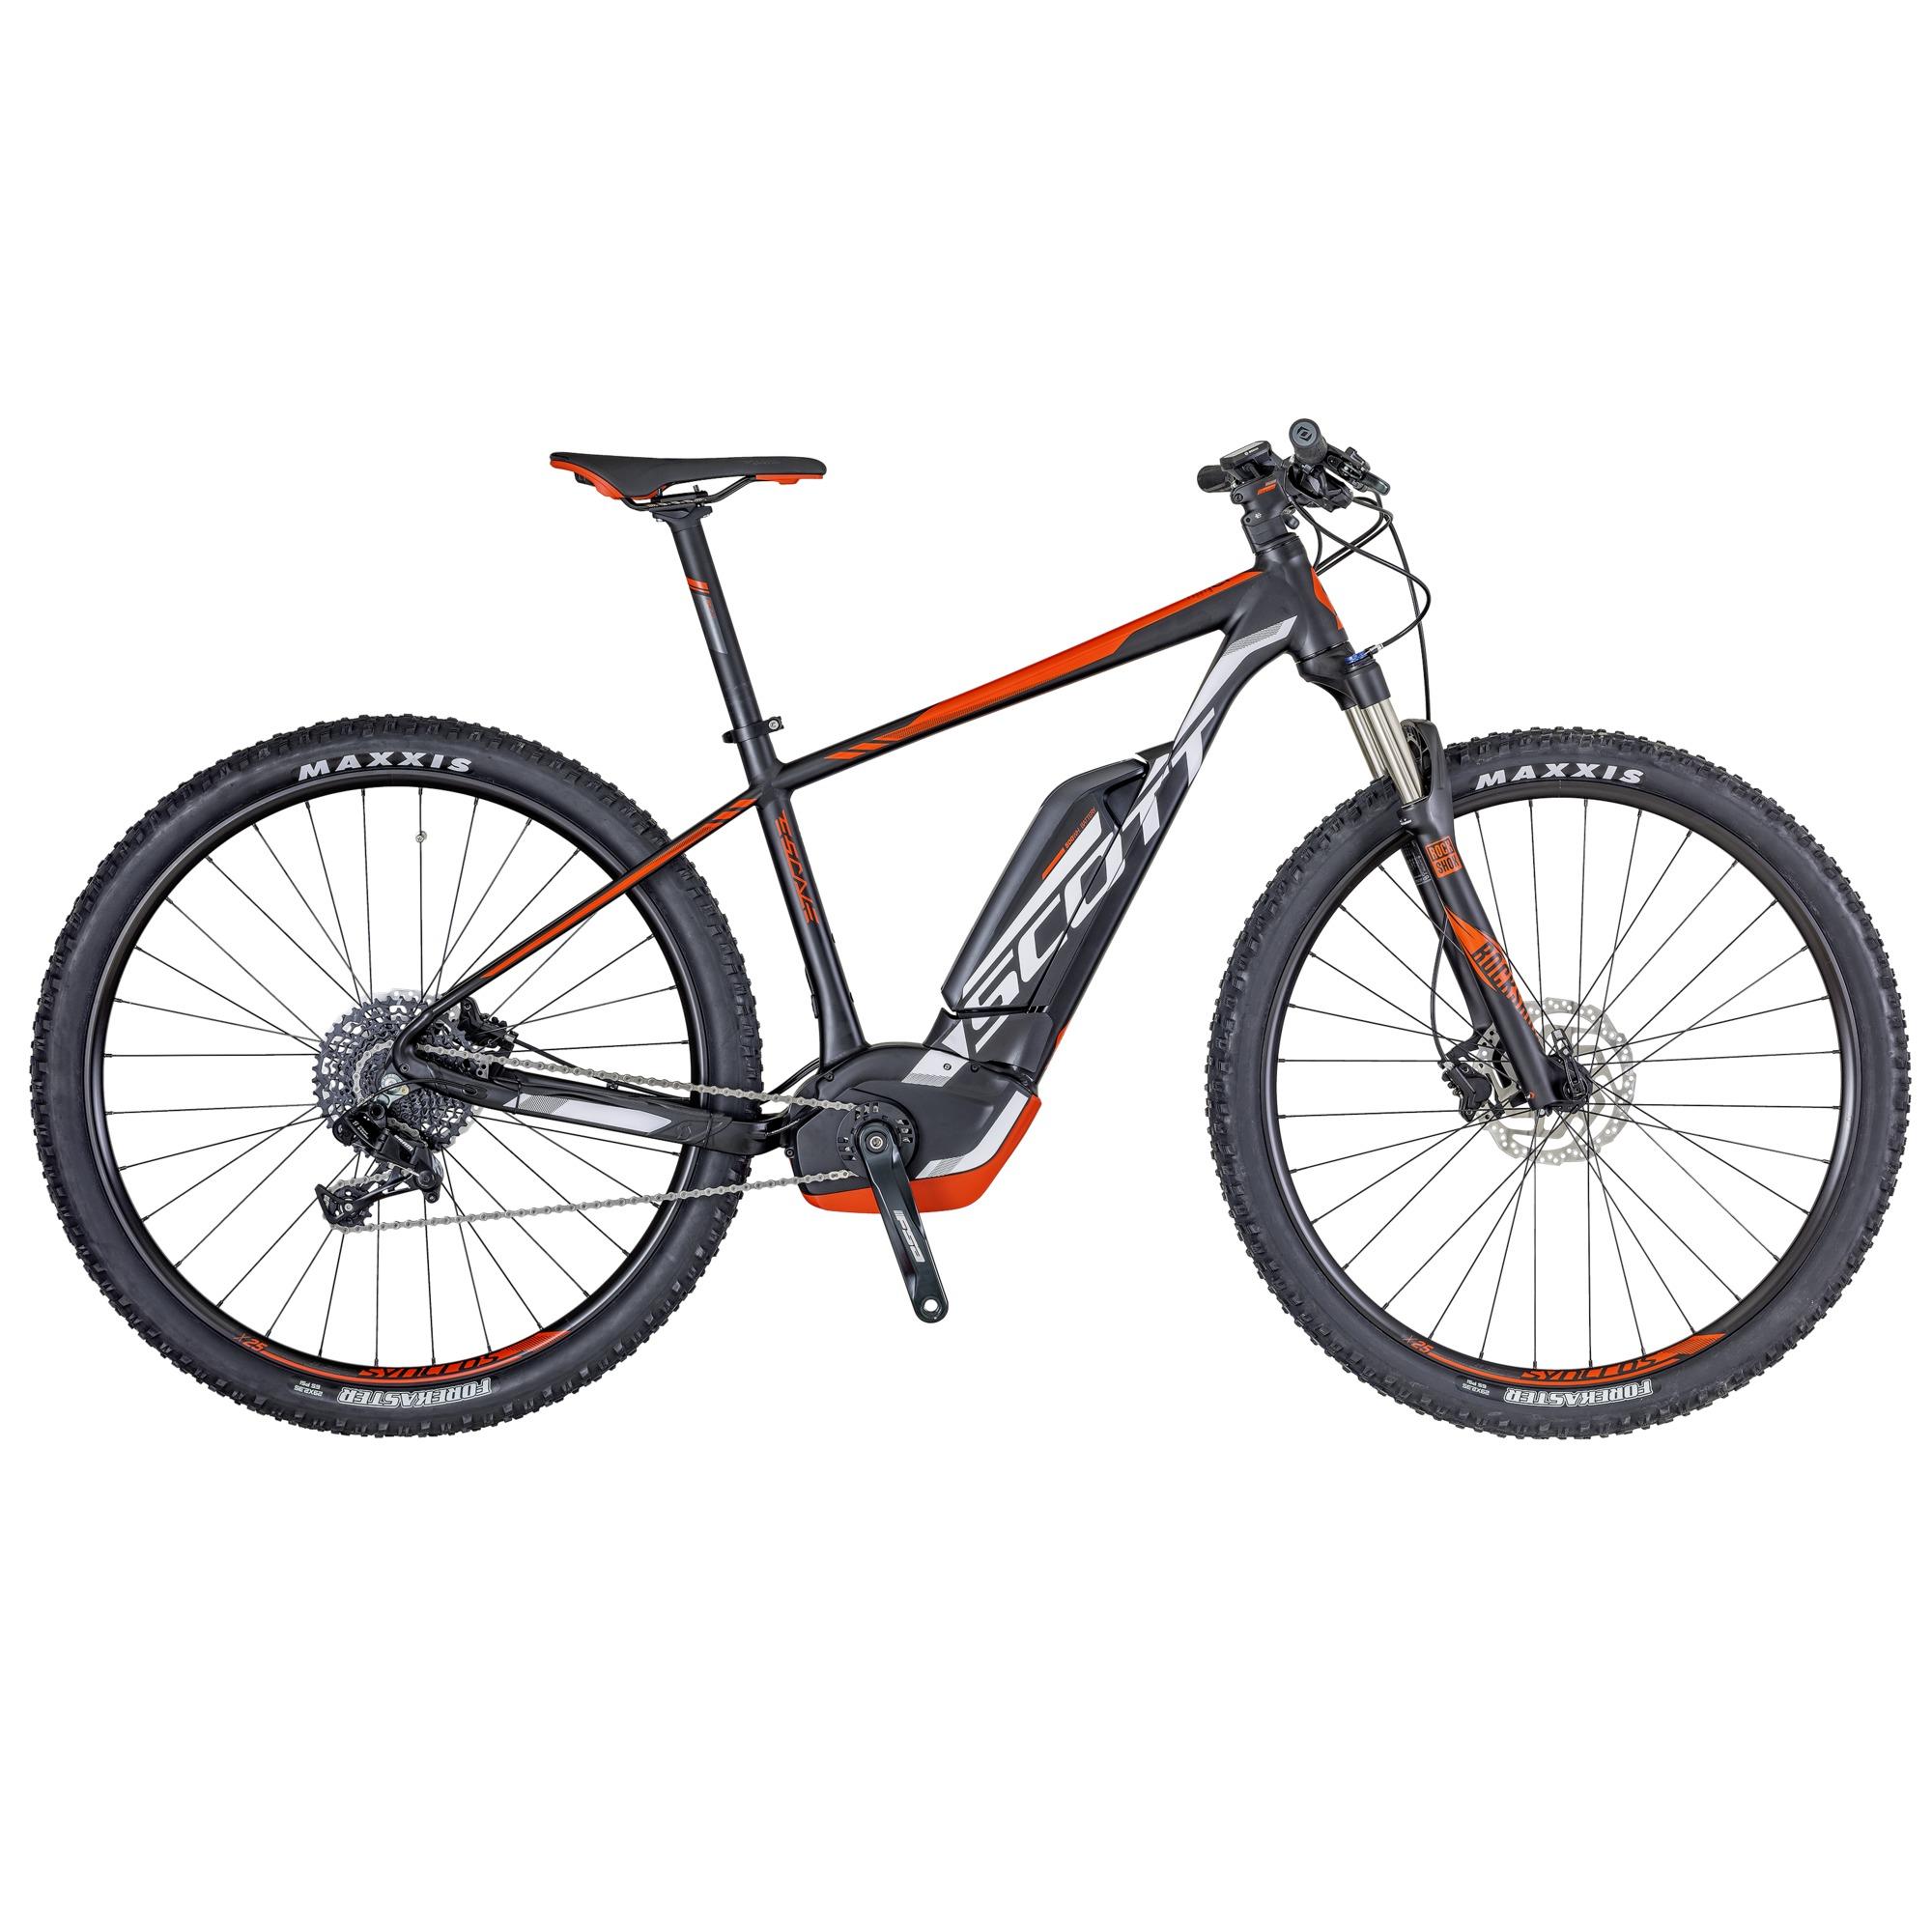 SCOTT E-Scale 930 Bike L - Zweirad Homann